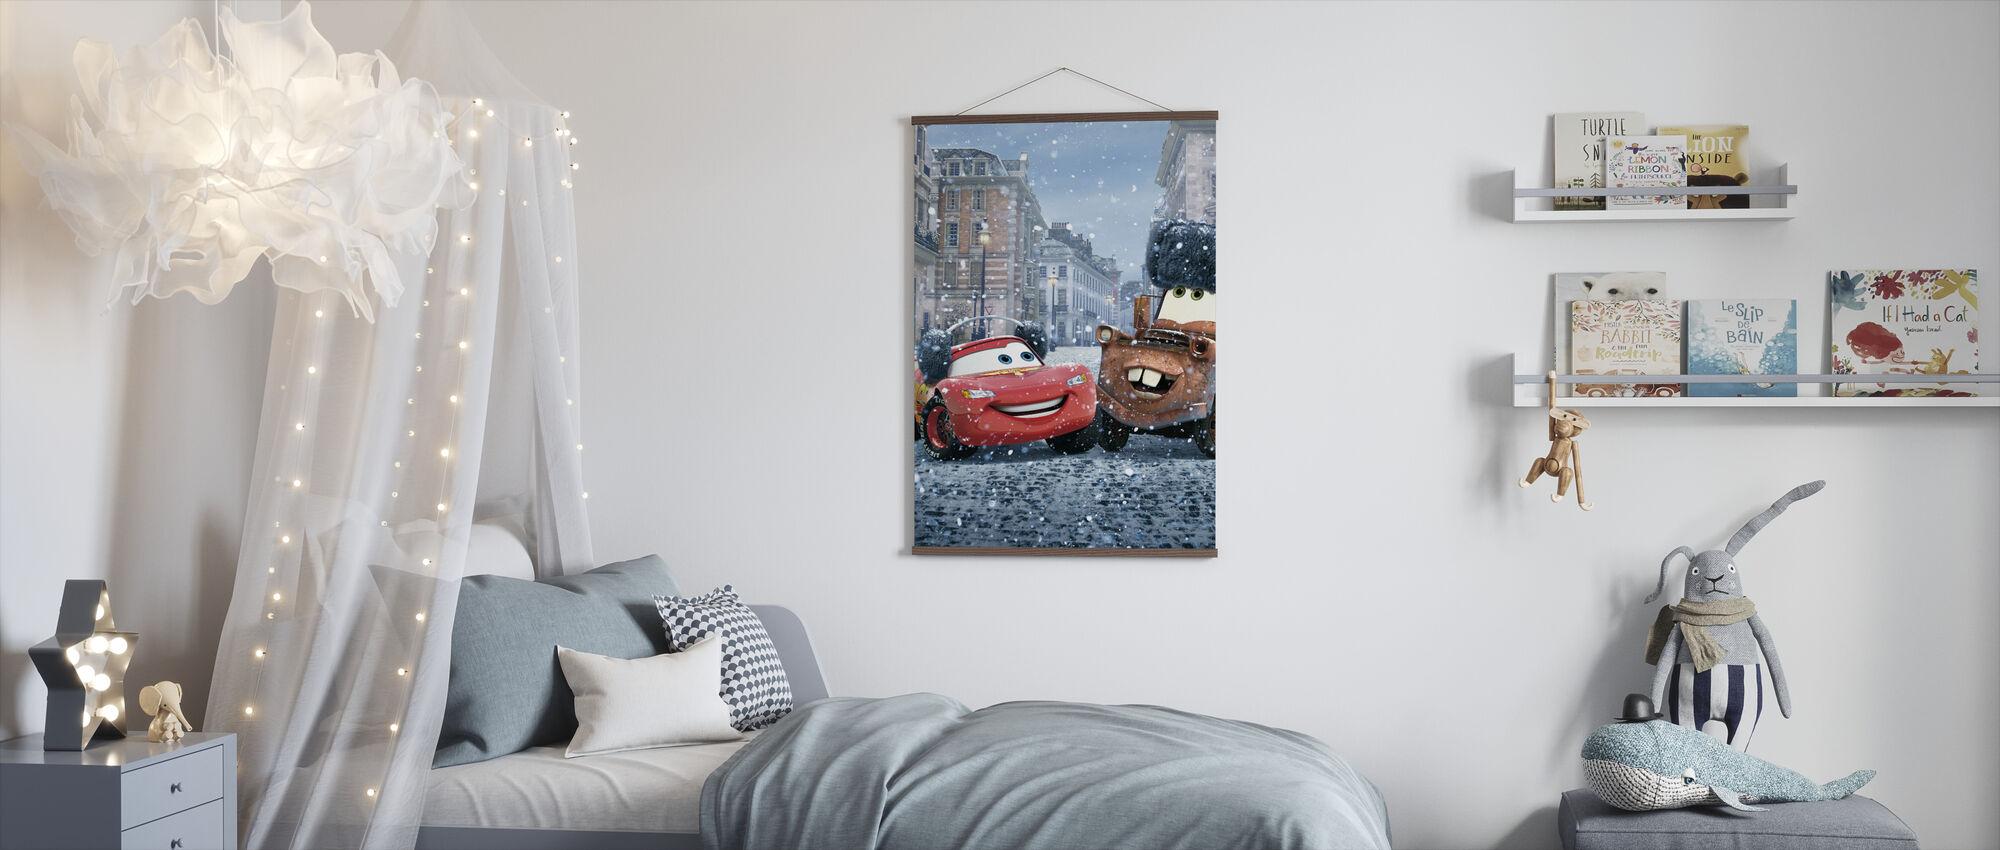 Biler - Lynet McQueen Mater - Plakat - Barnerom